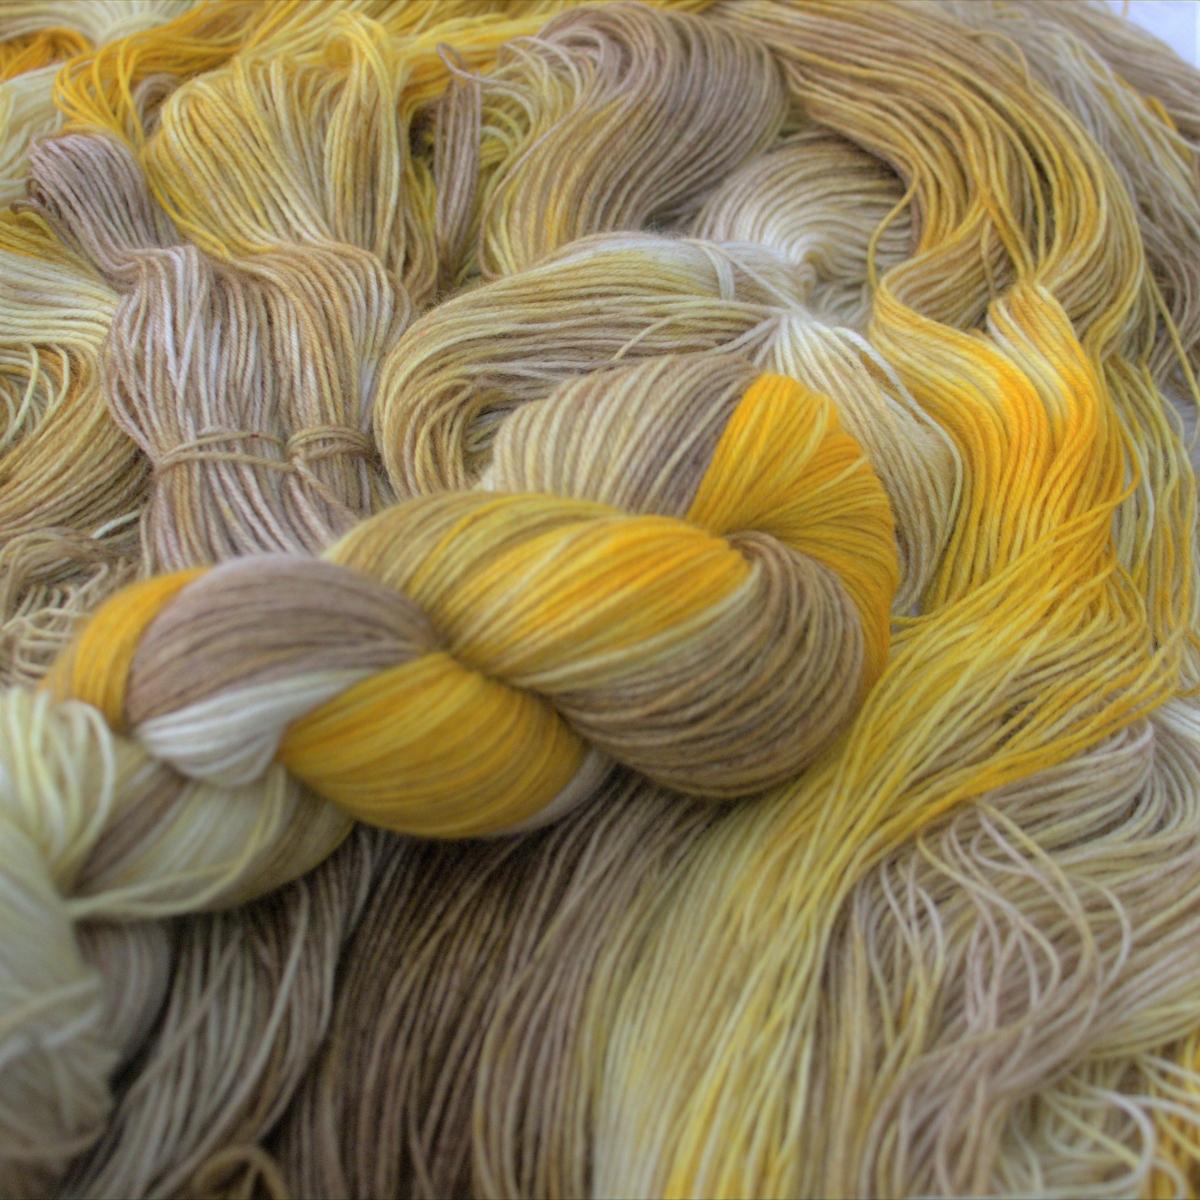 woodico.pro hand dyed yarn 049 1 1200x1200 - Hand dyed yarn / 049